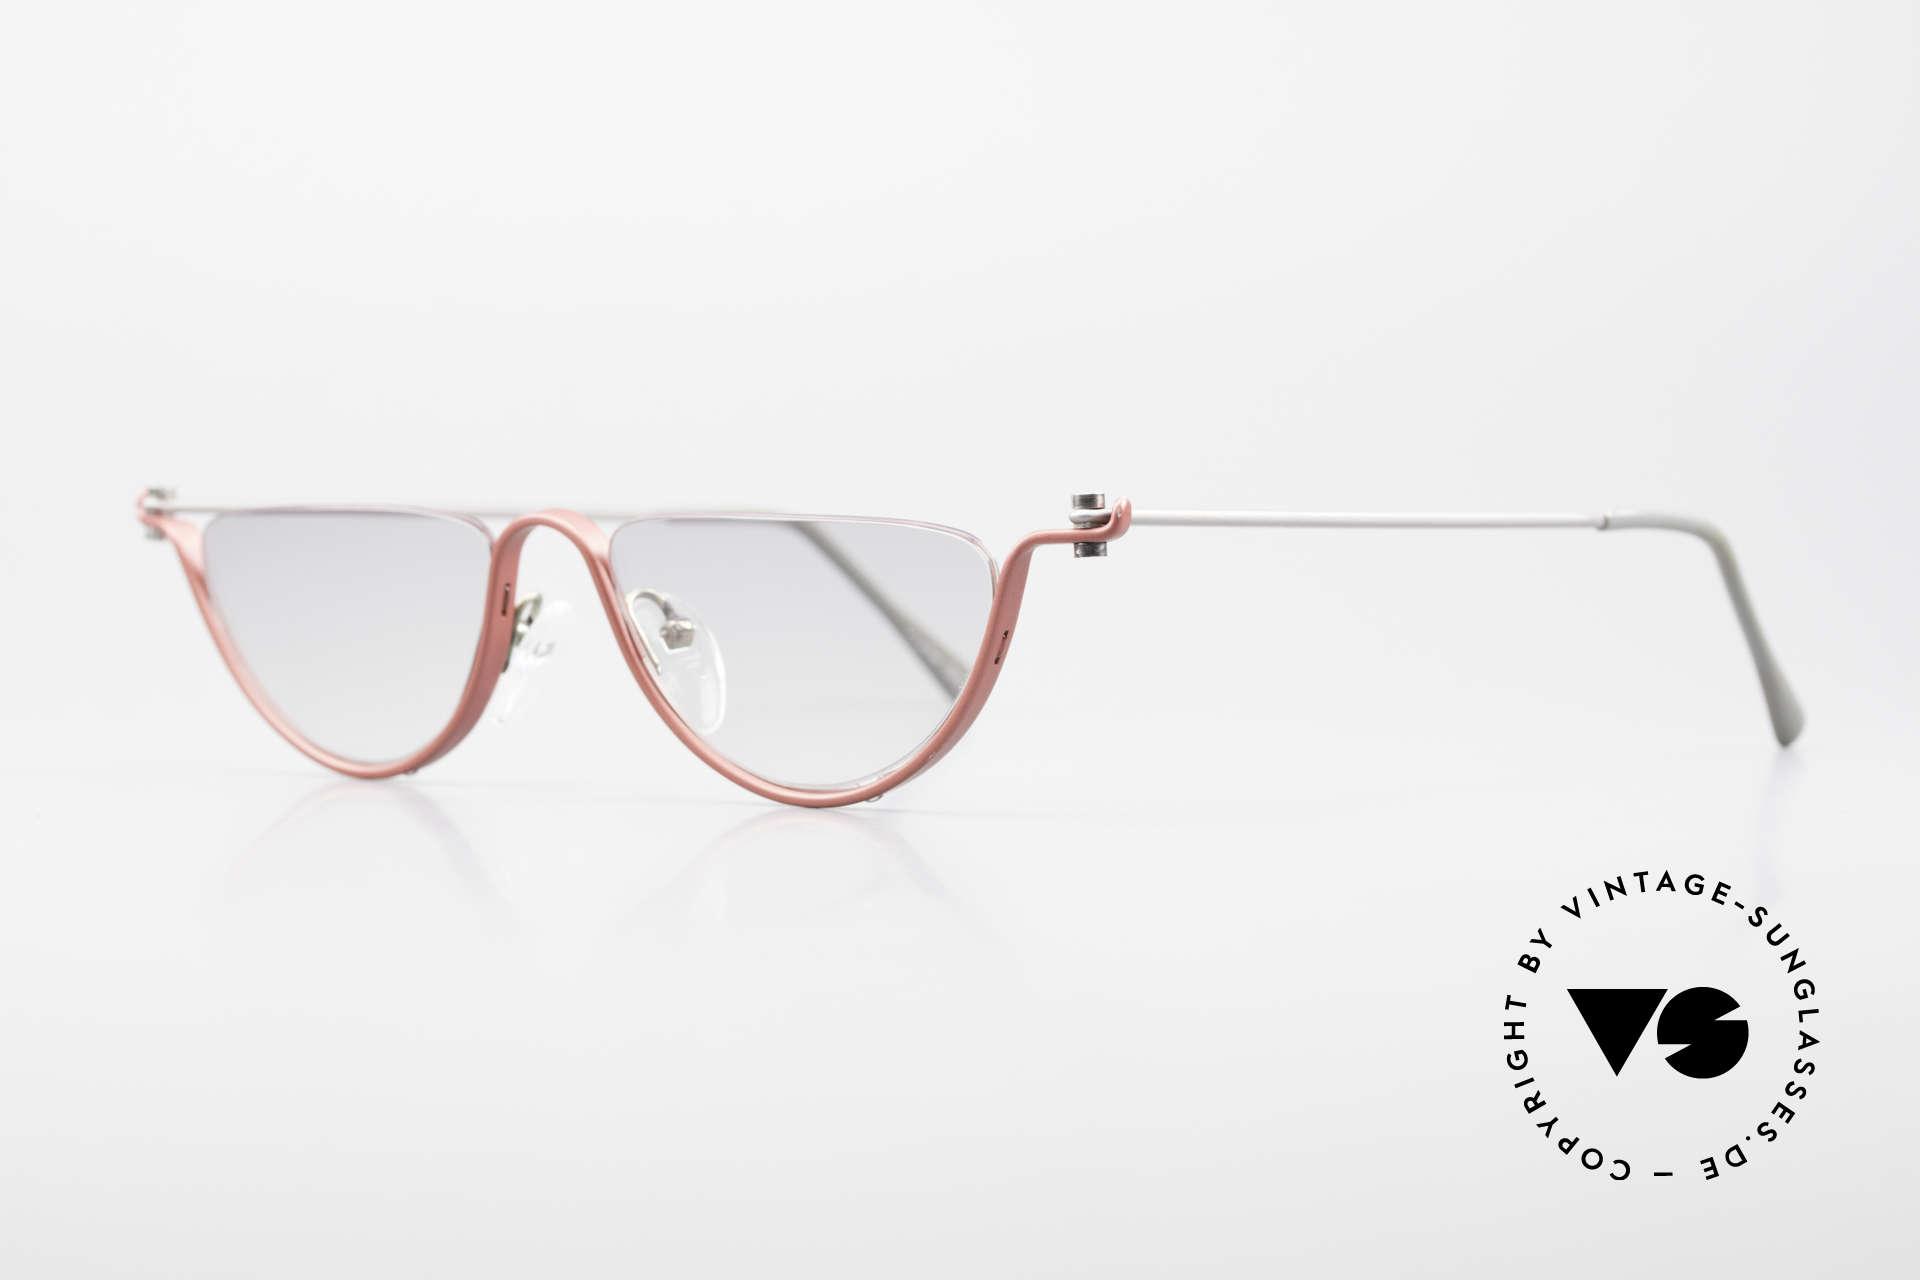 ProDesign No11 Gail Spence Design Sunglasses, successor of the legendary Pro Design N° ONE model, Made for Women